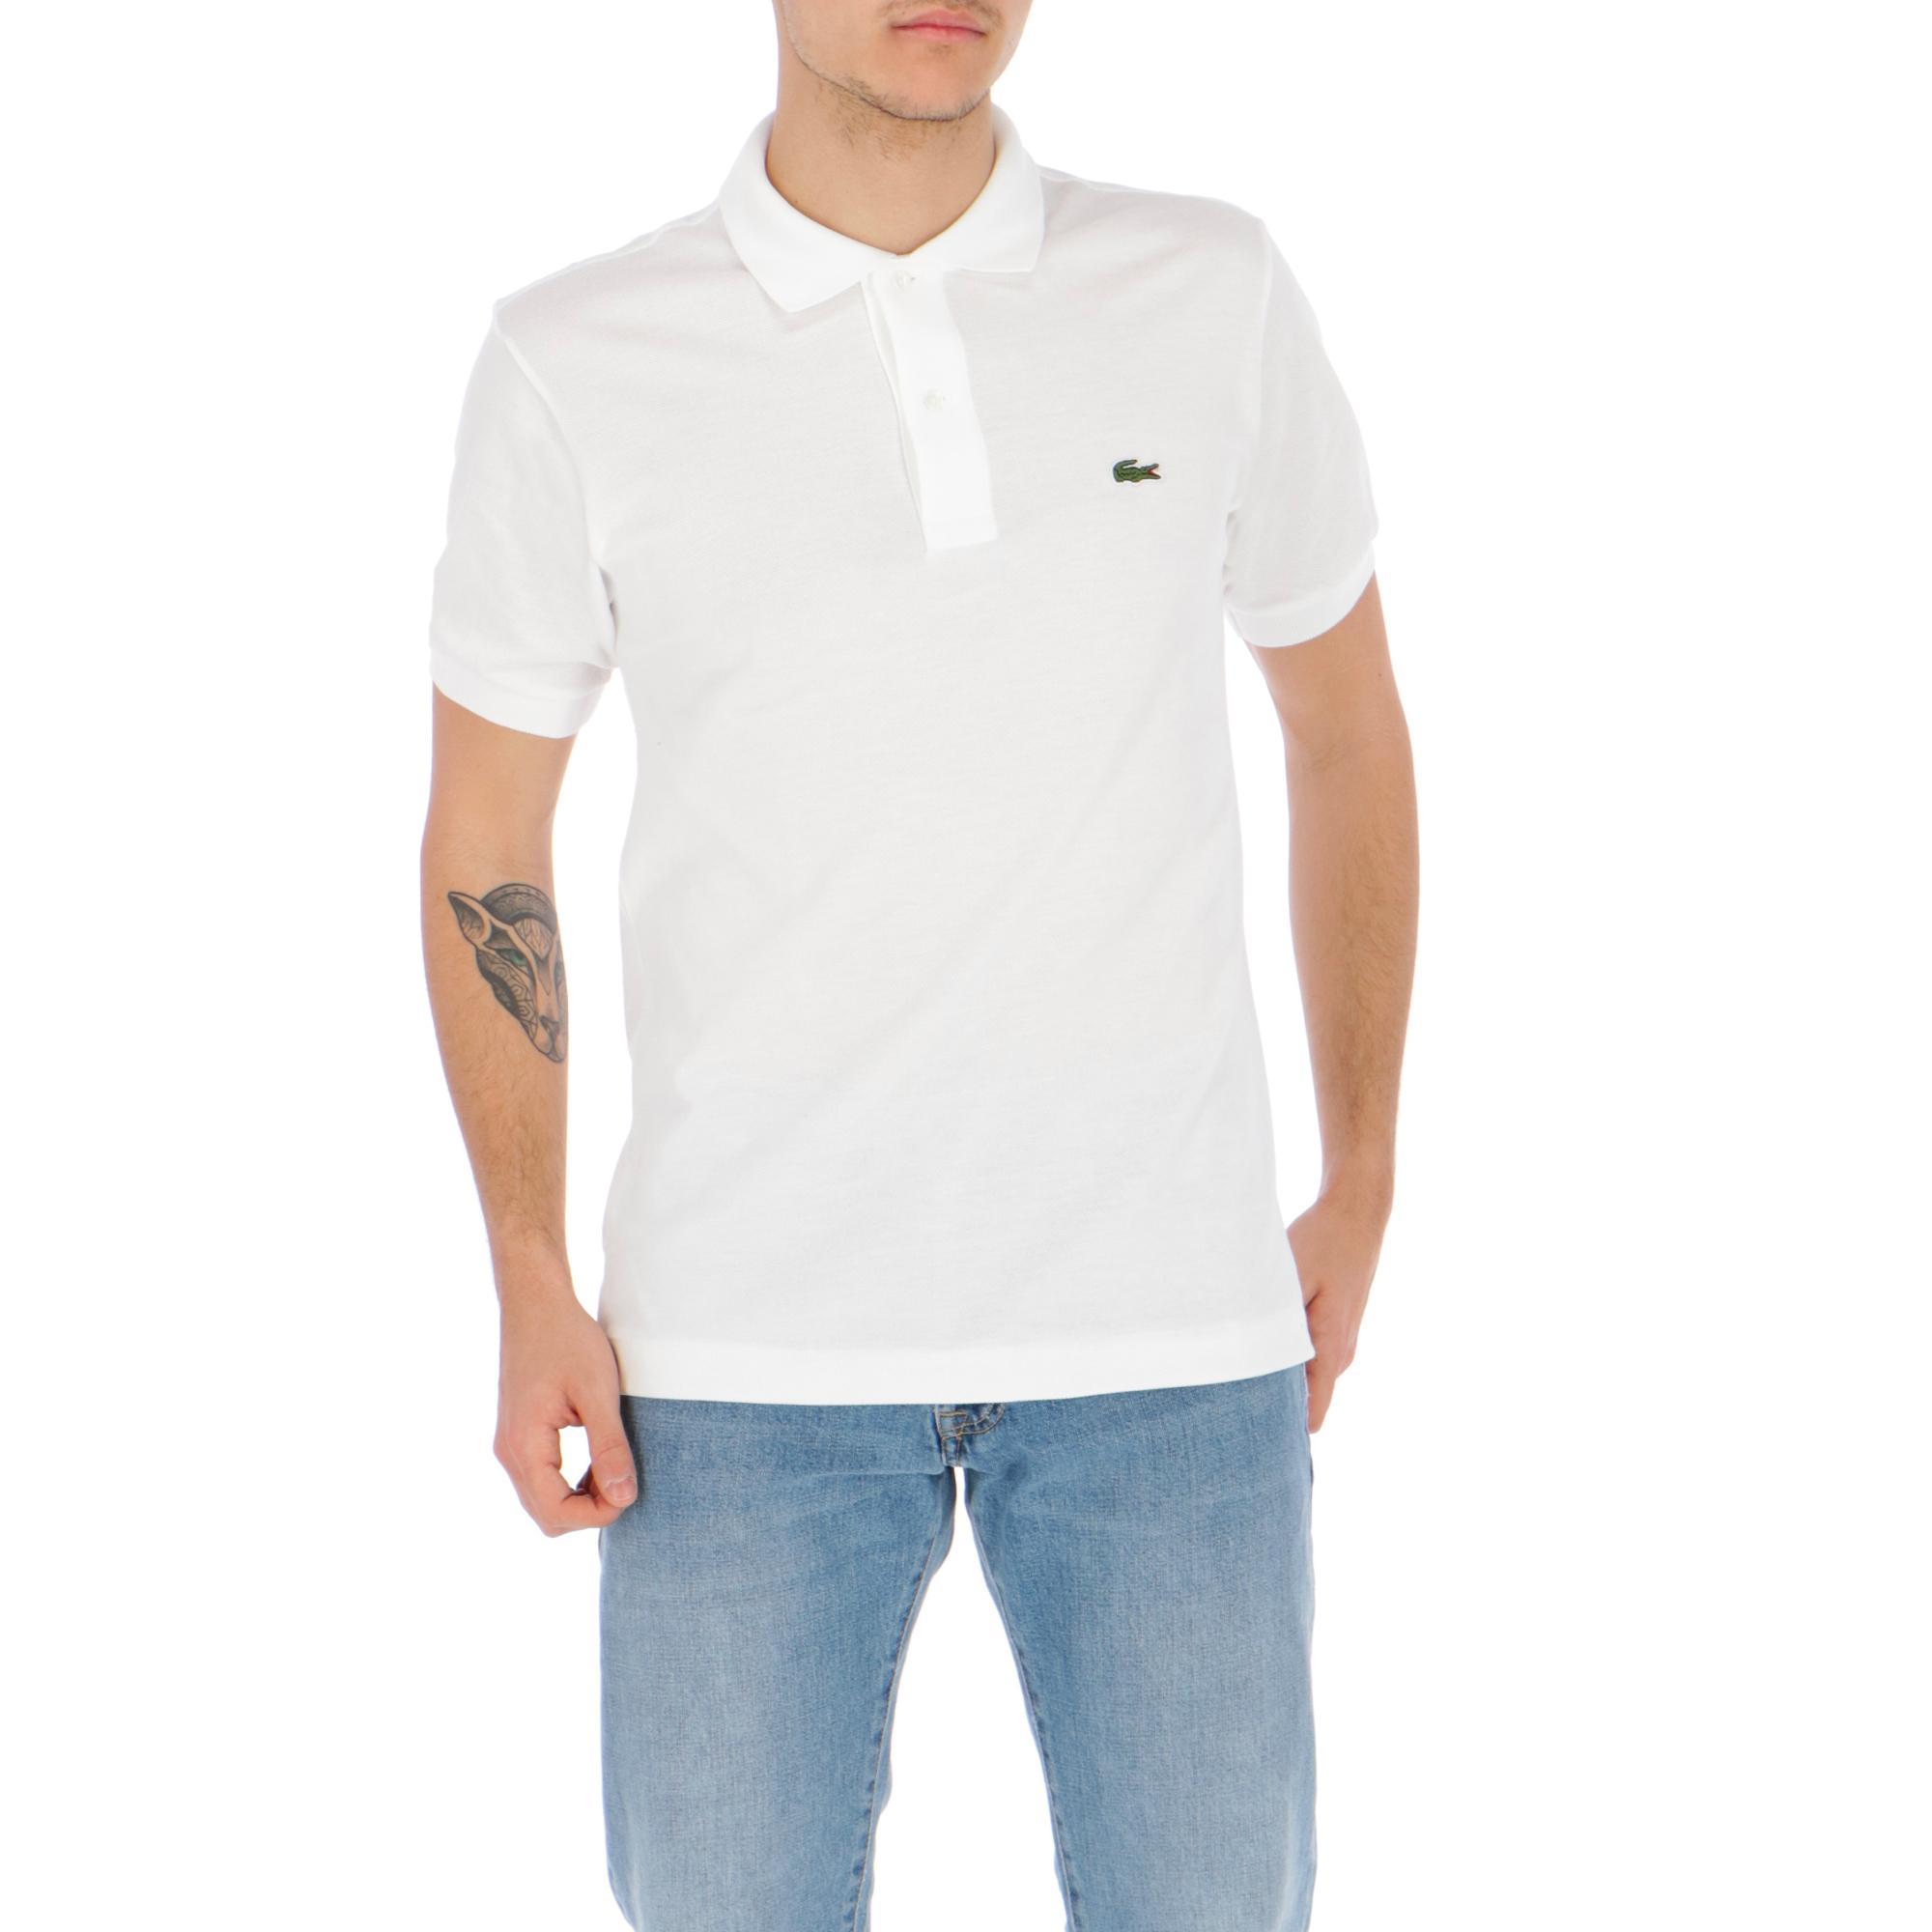 570d243b6f Lacoste Polo White | Treesse